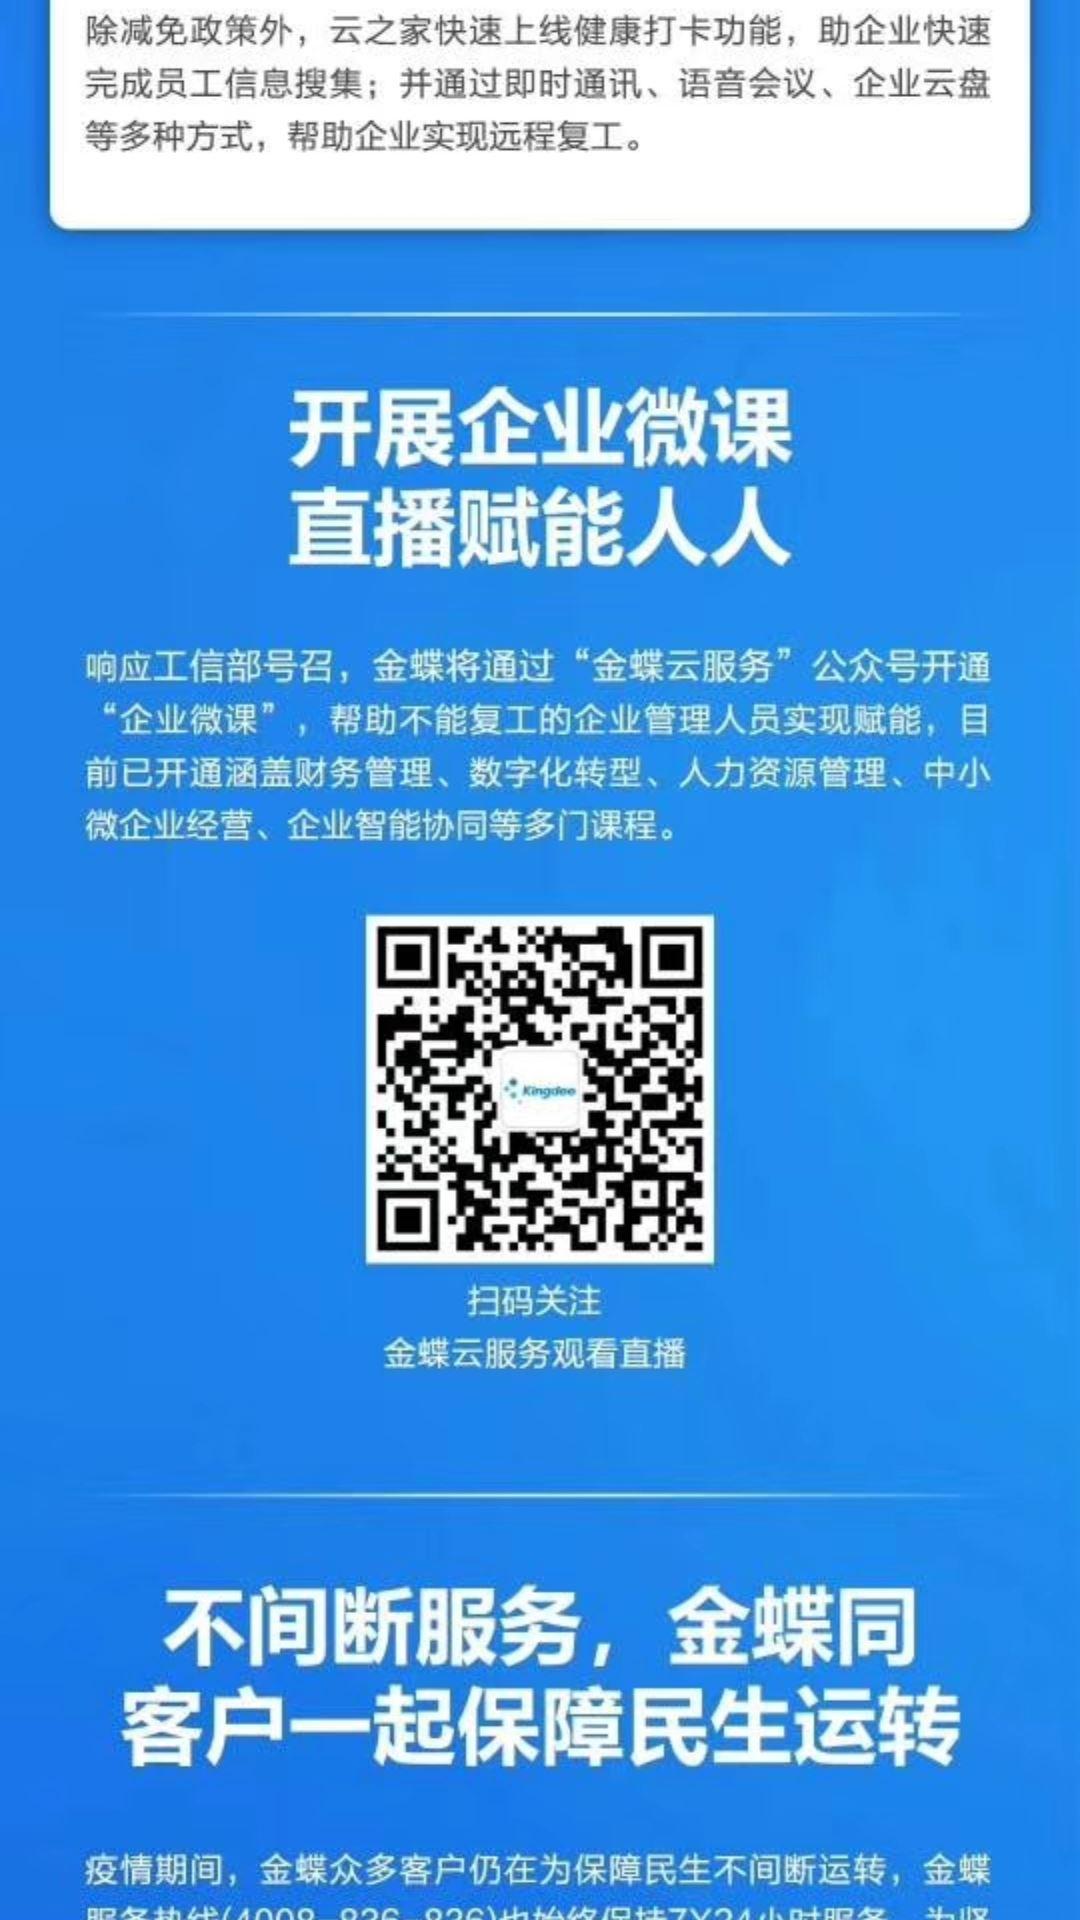 http://www.huodongxing.com/file/20141106/1061770950376/913698670518356.jpg